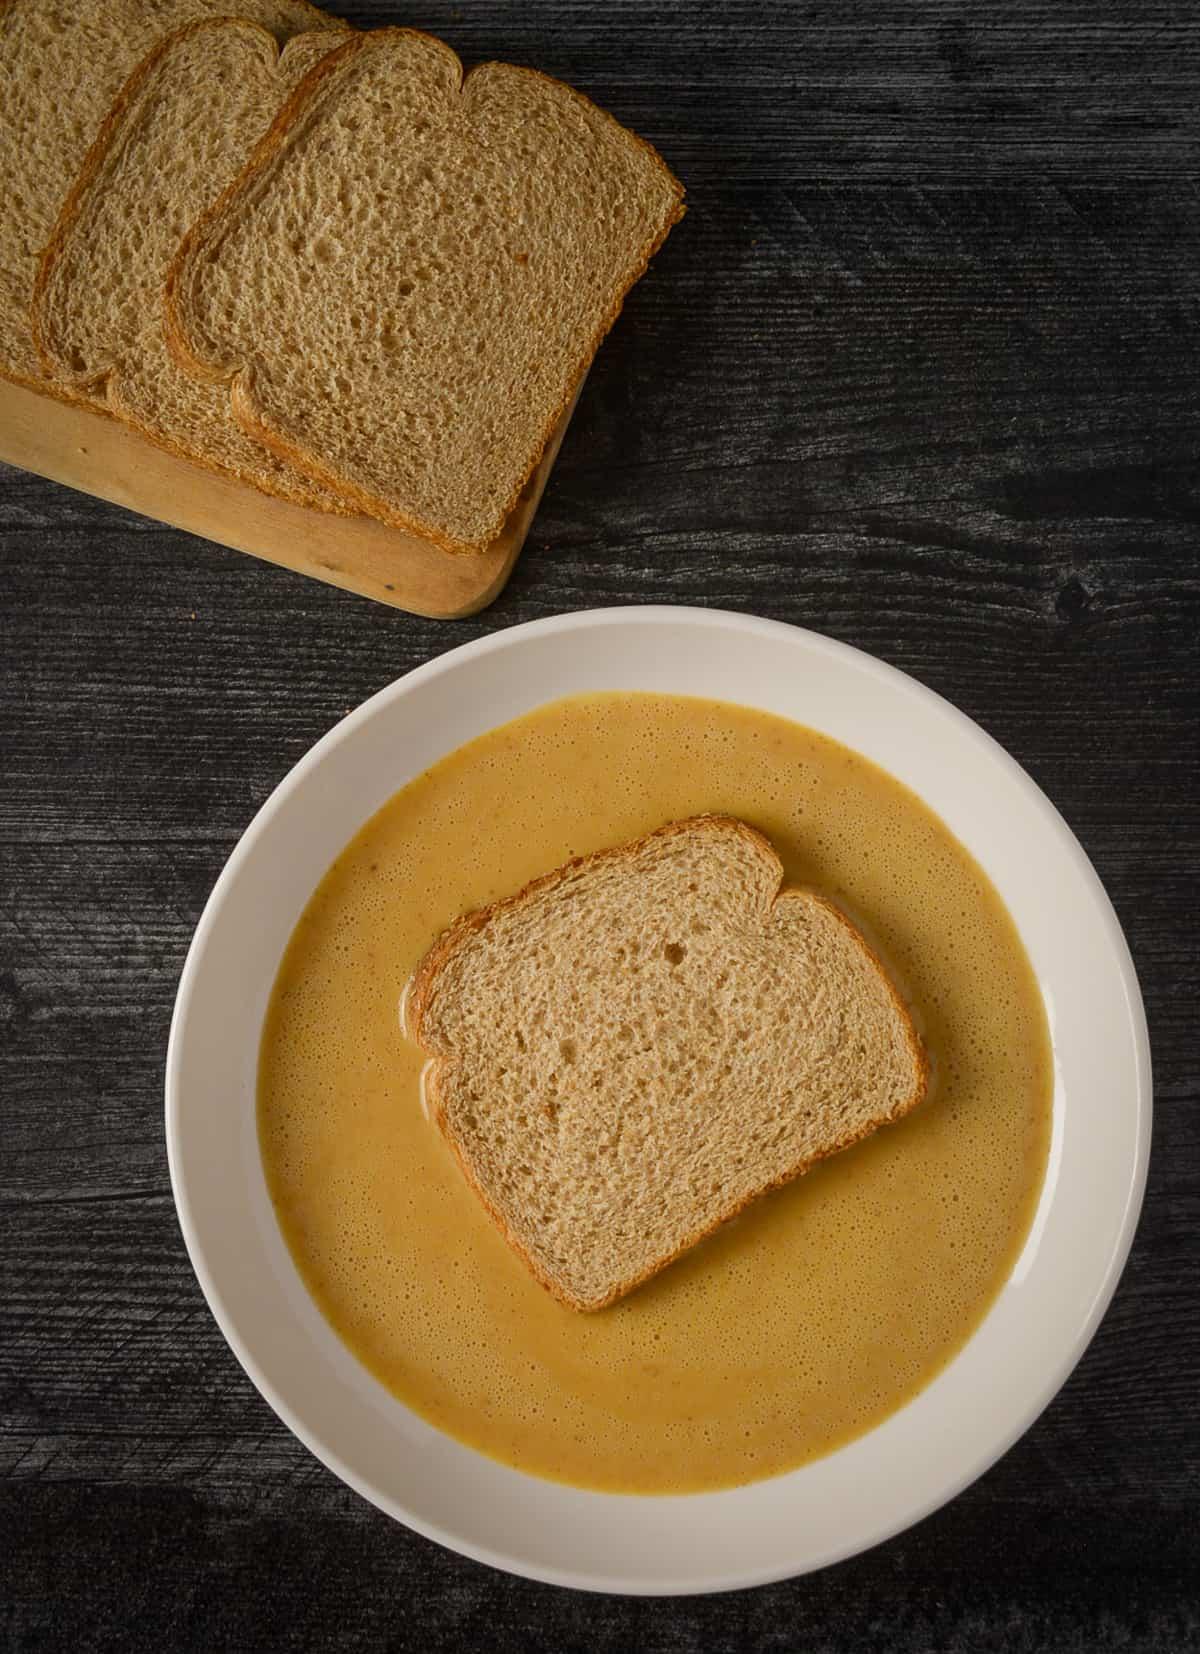 Bread in french toast custard.